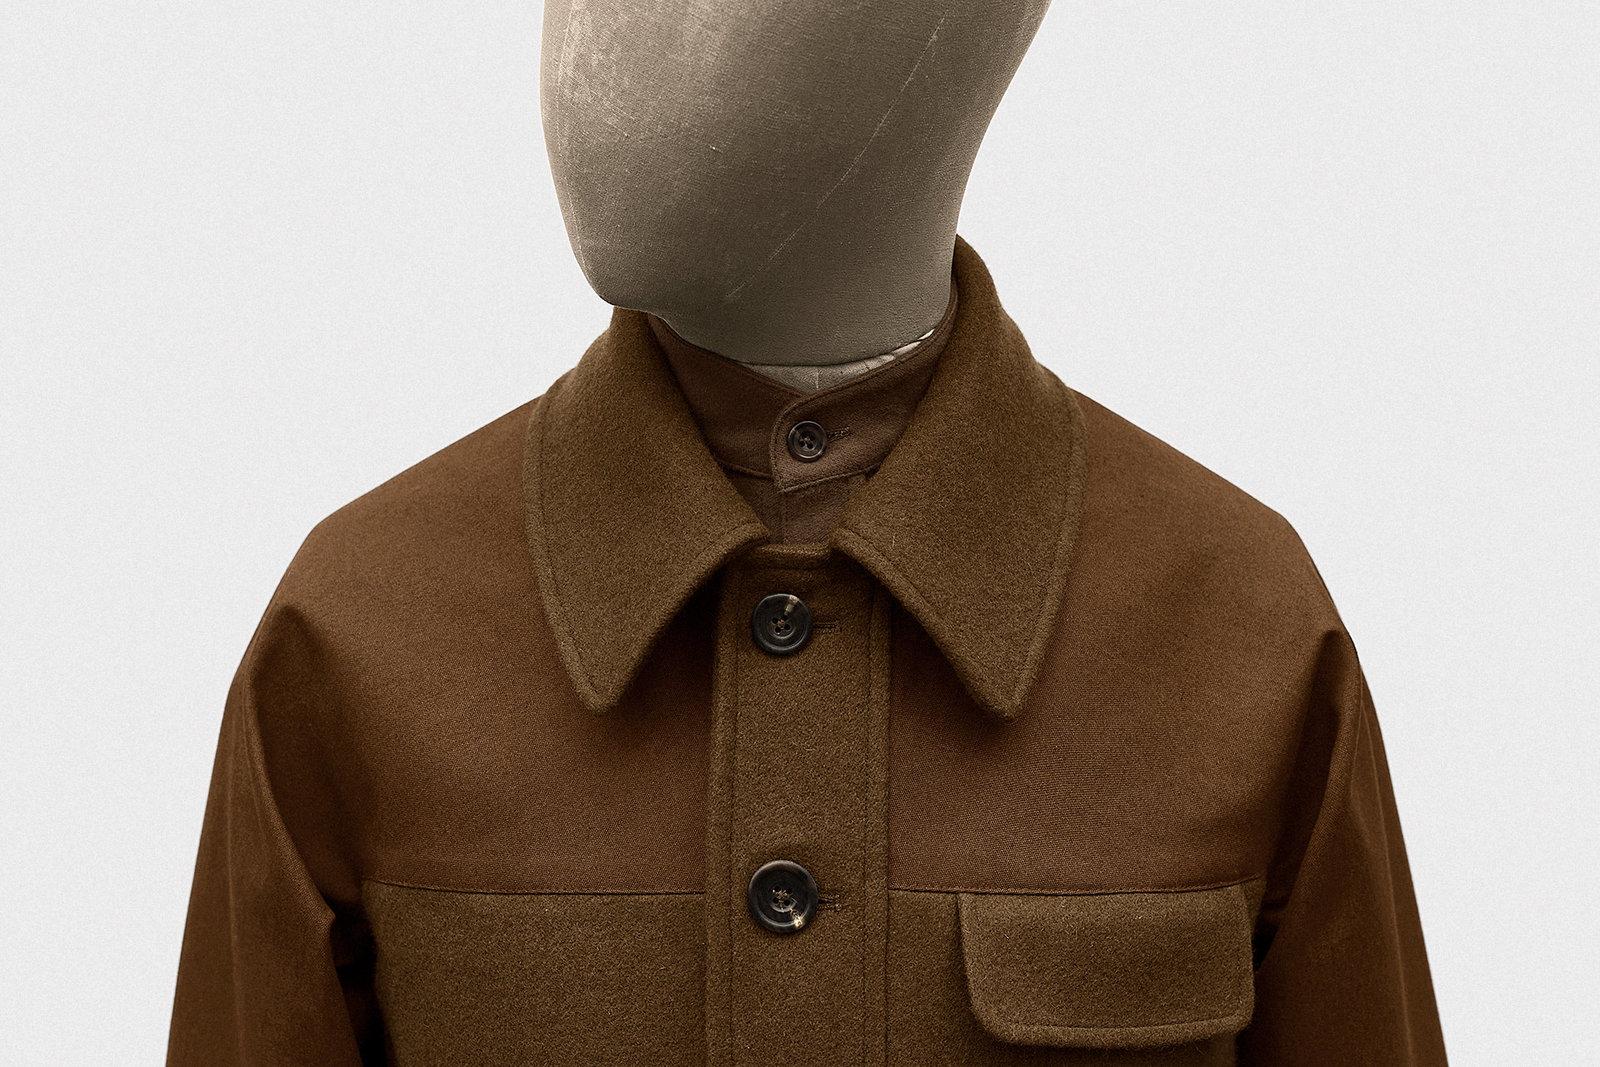 donkey-jacket-woollen-melton-cotton-tobacco-3@2x.jpg